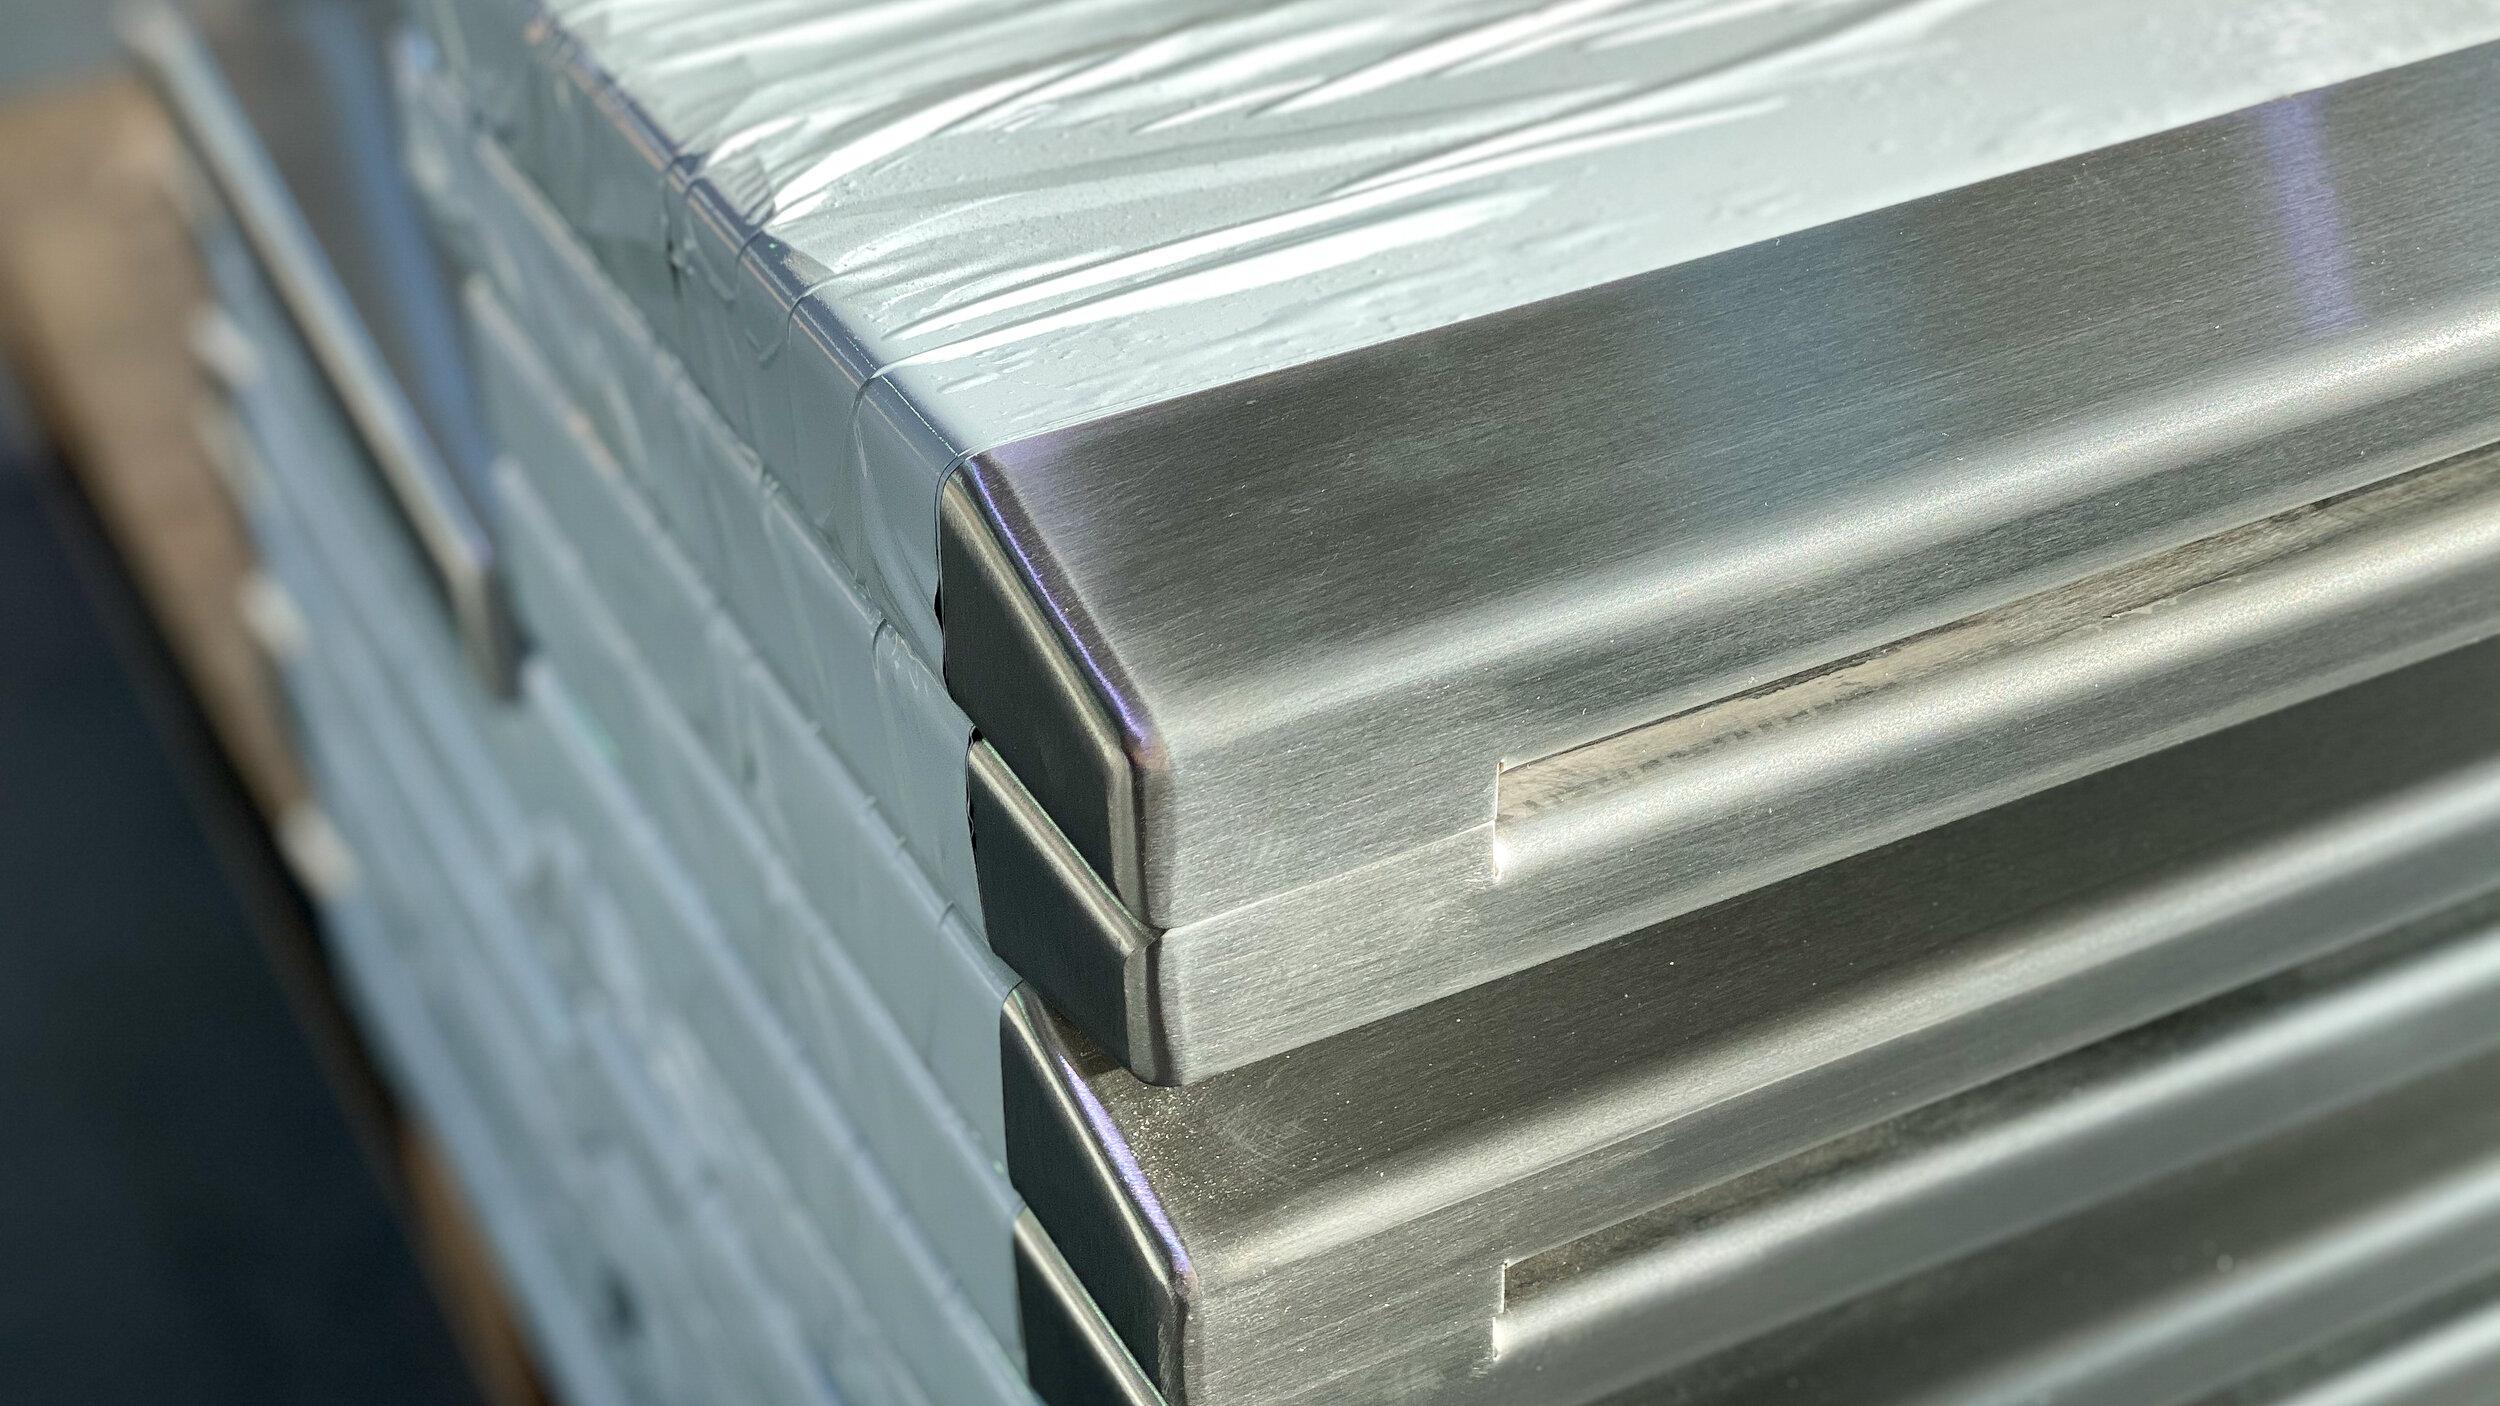 Lee Hing Sheet Metal Fabrication Oem Odm Digital Signage Conveyor And More